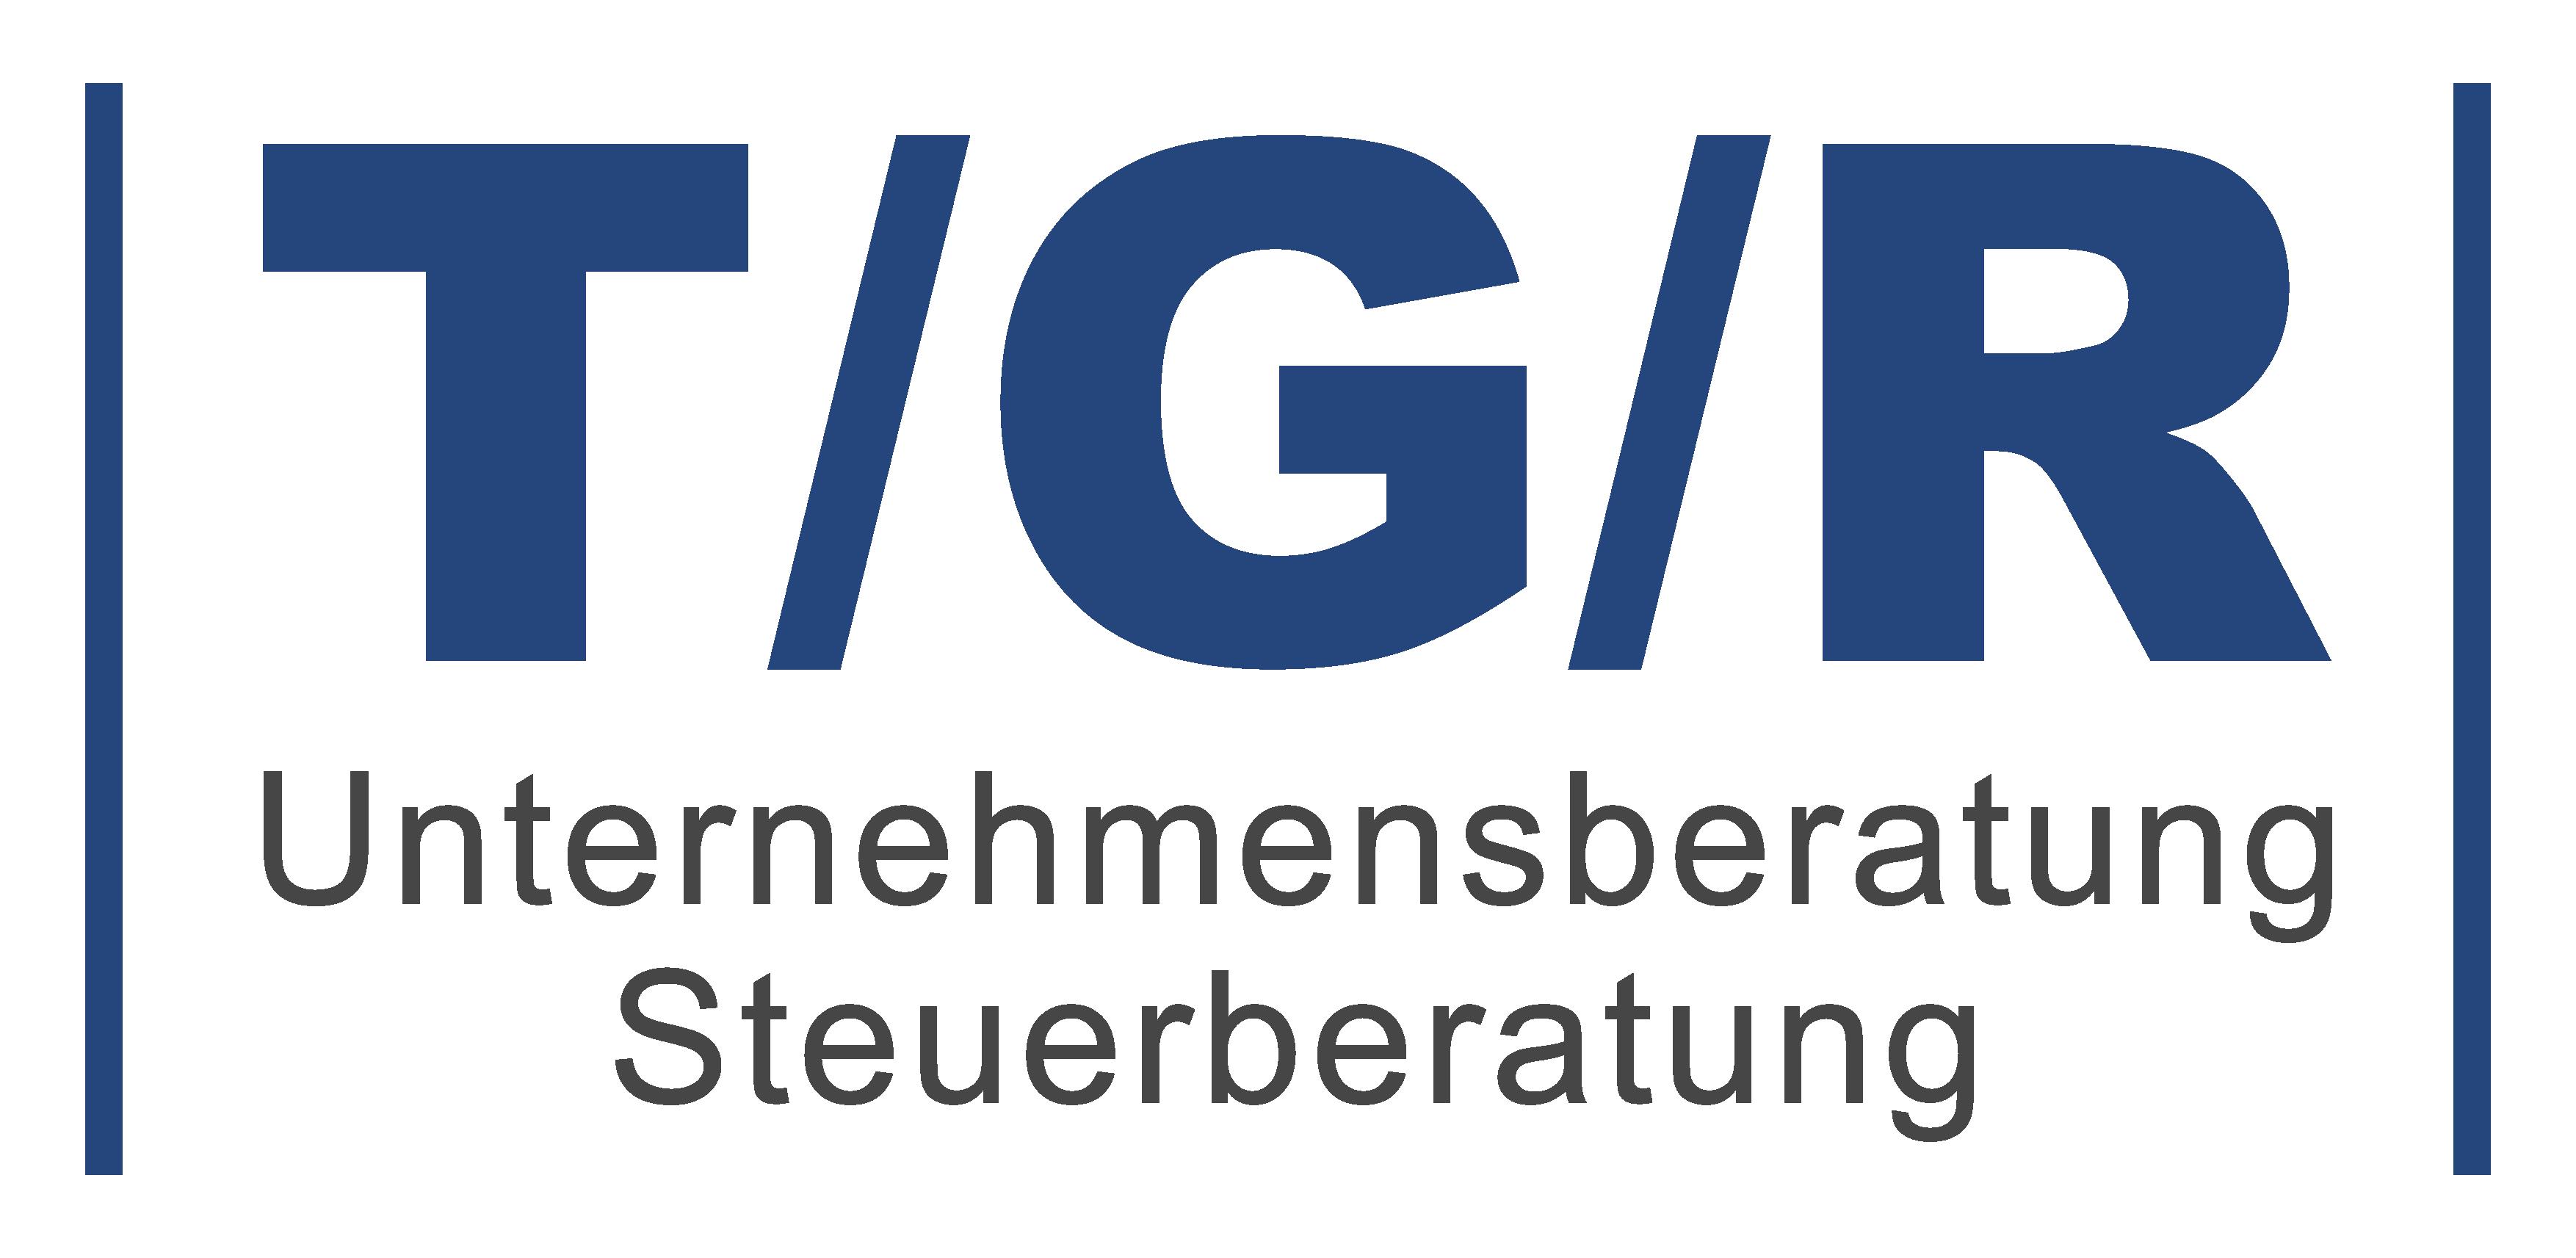 T/G/R Unternehmensberatung und Steuerberatung